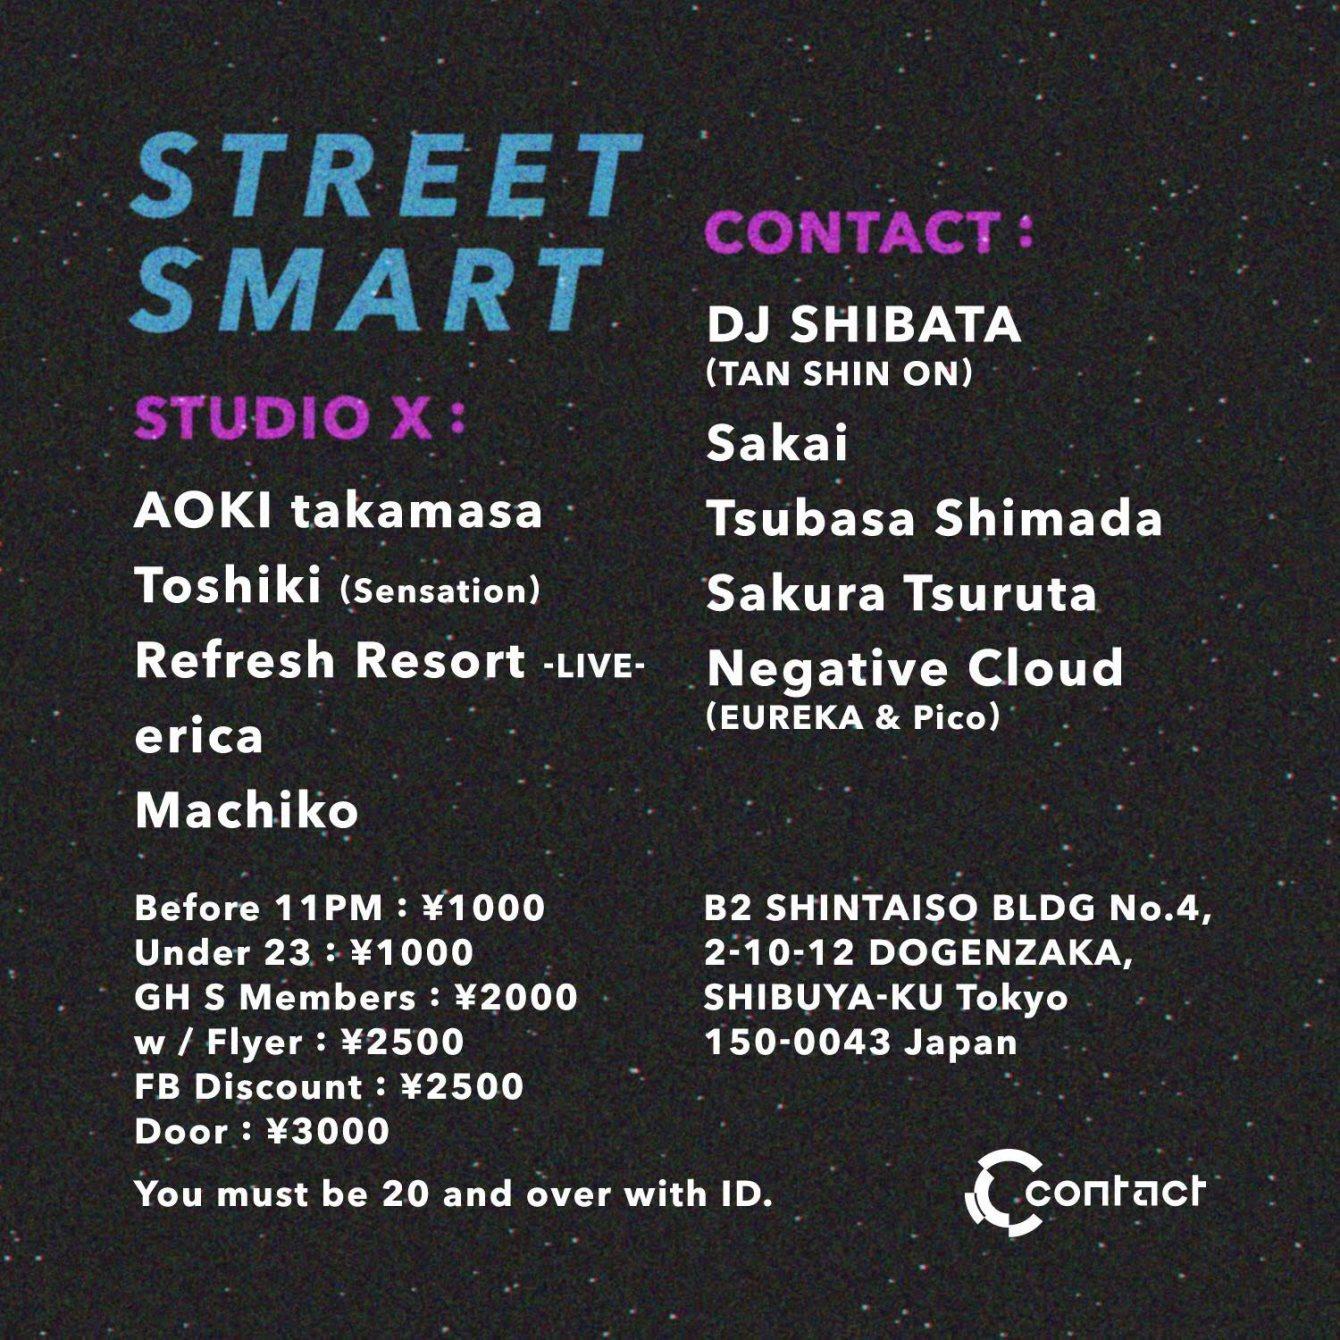 Street Smart - Flyer back